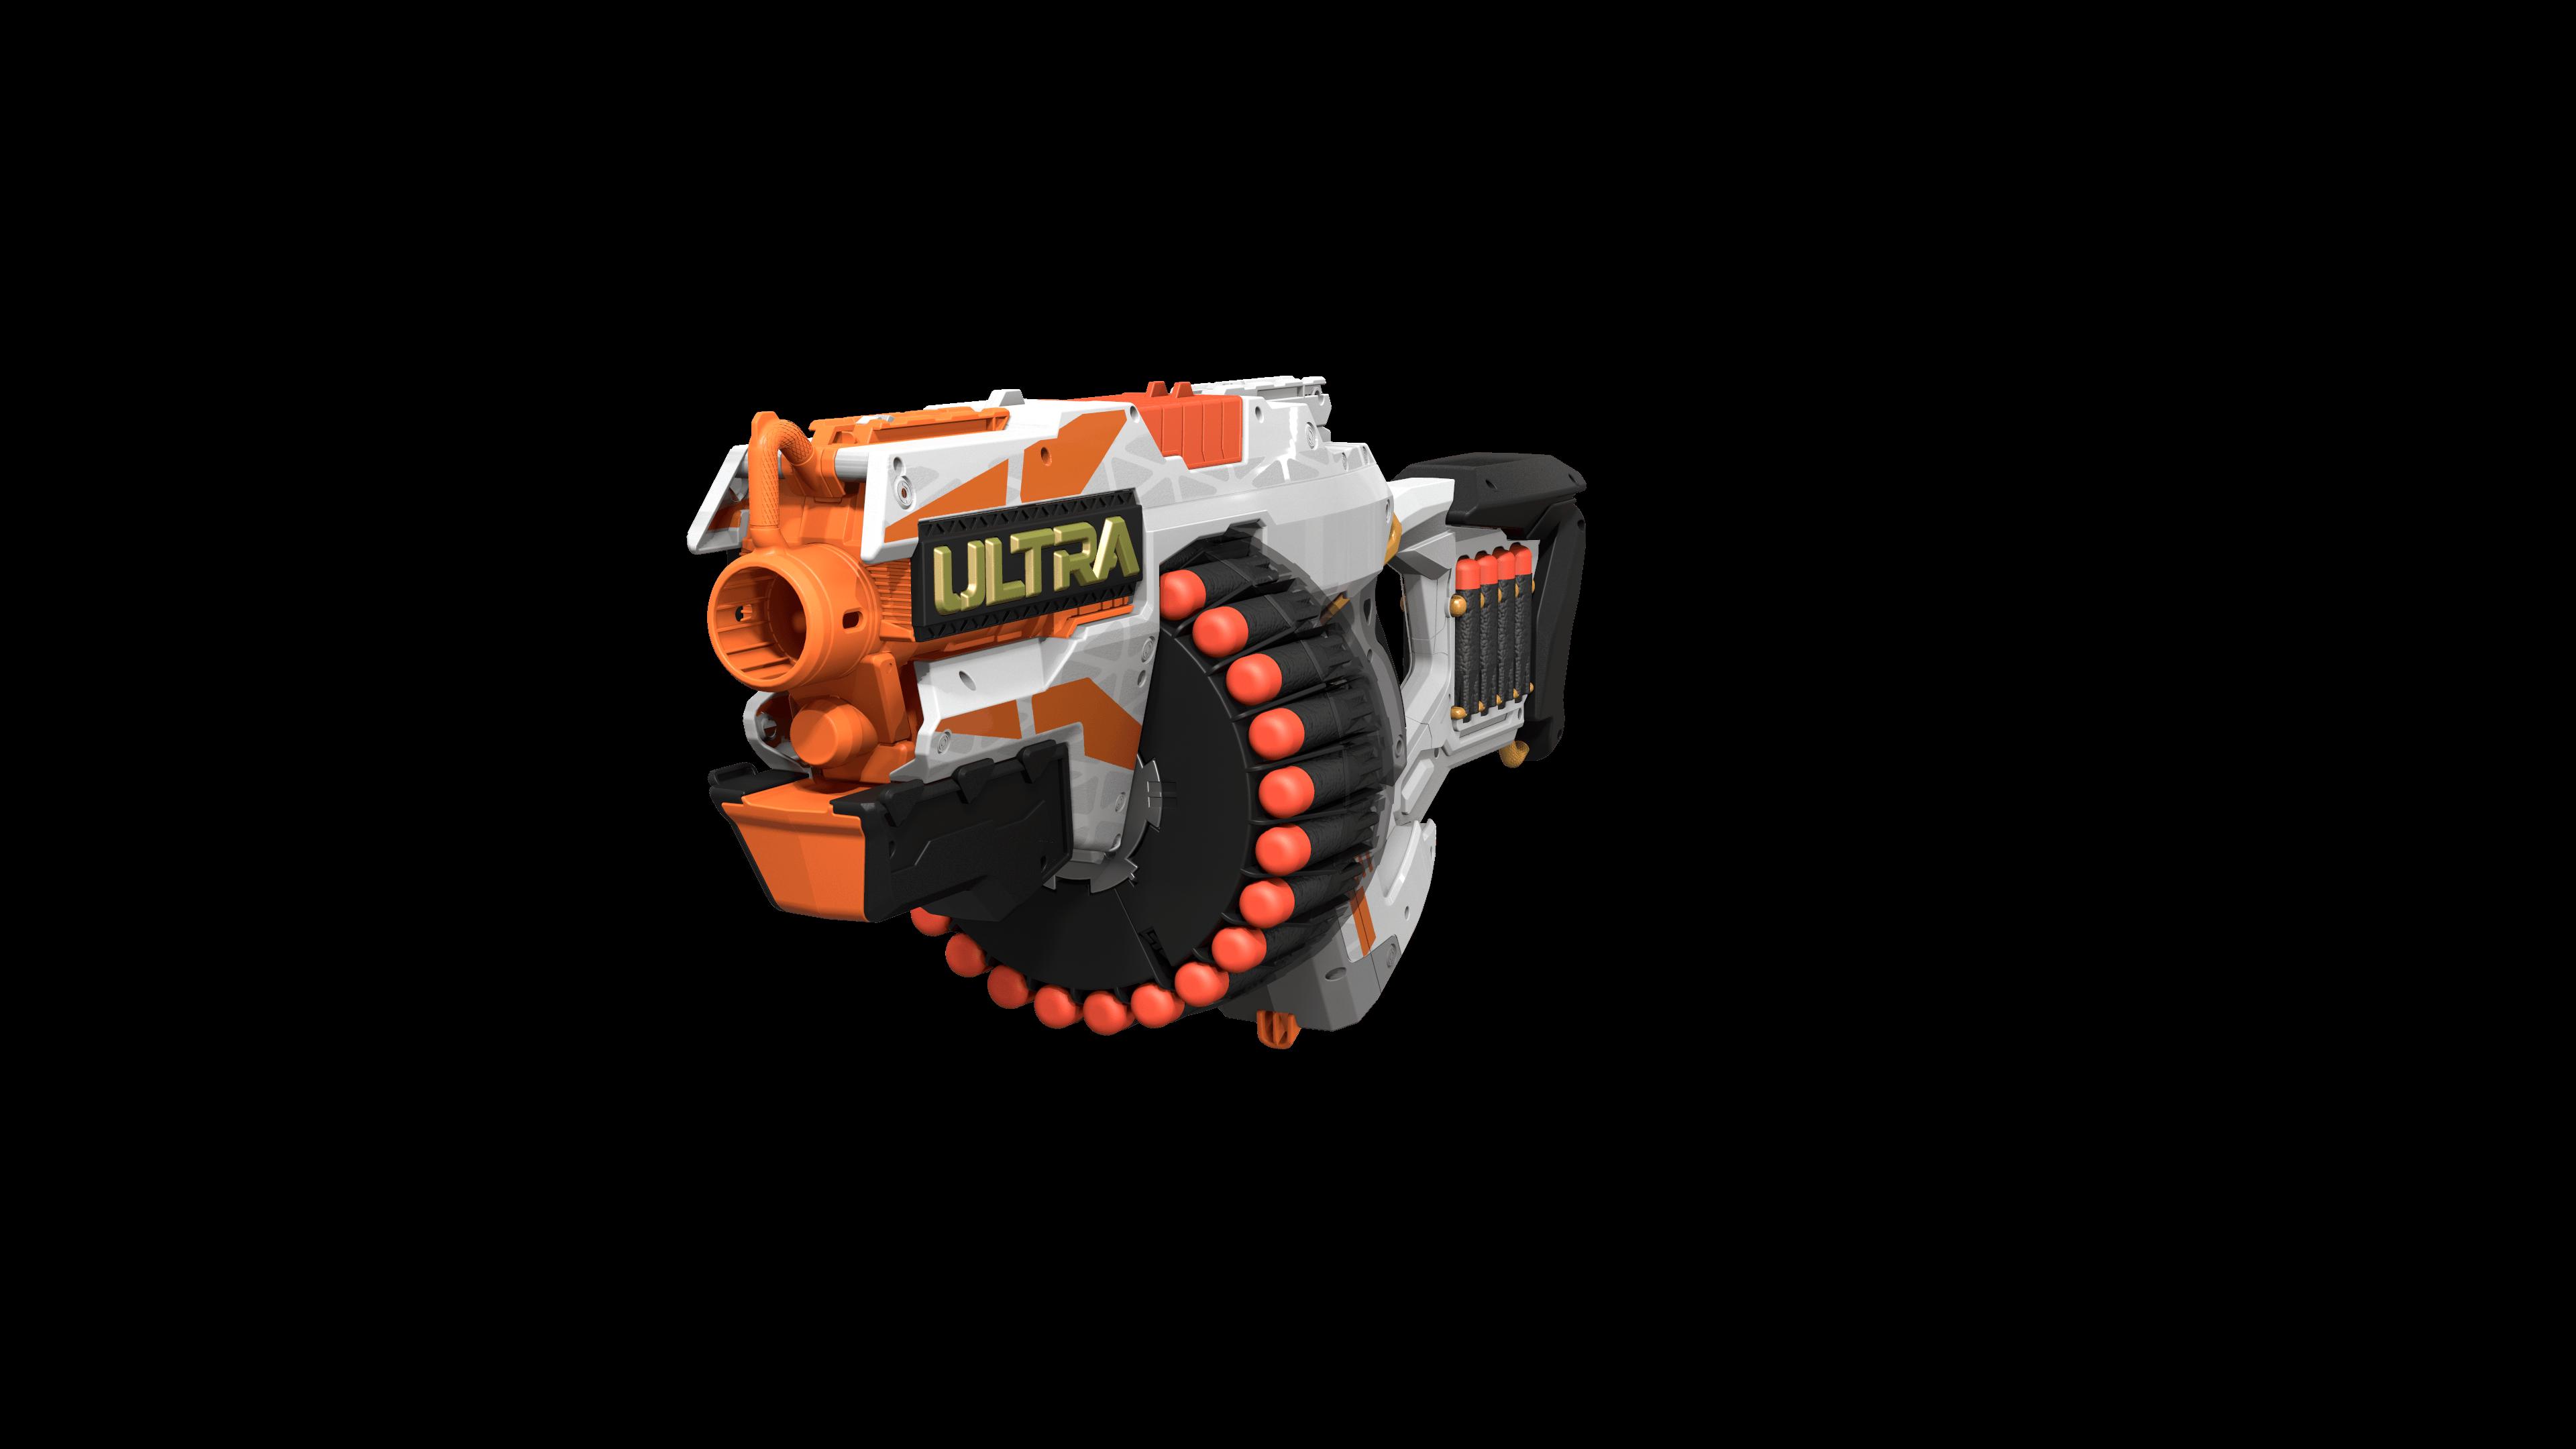 ultra blaster img 82